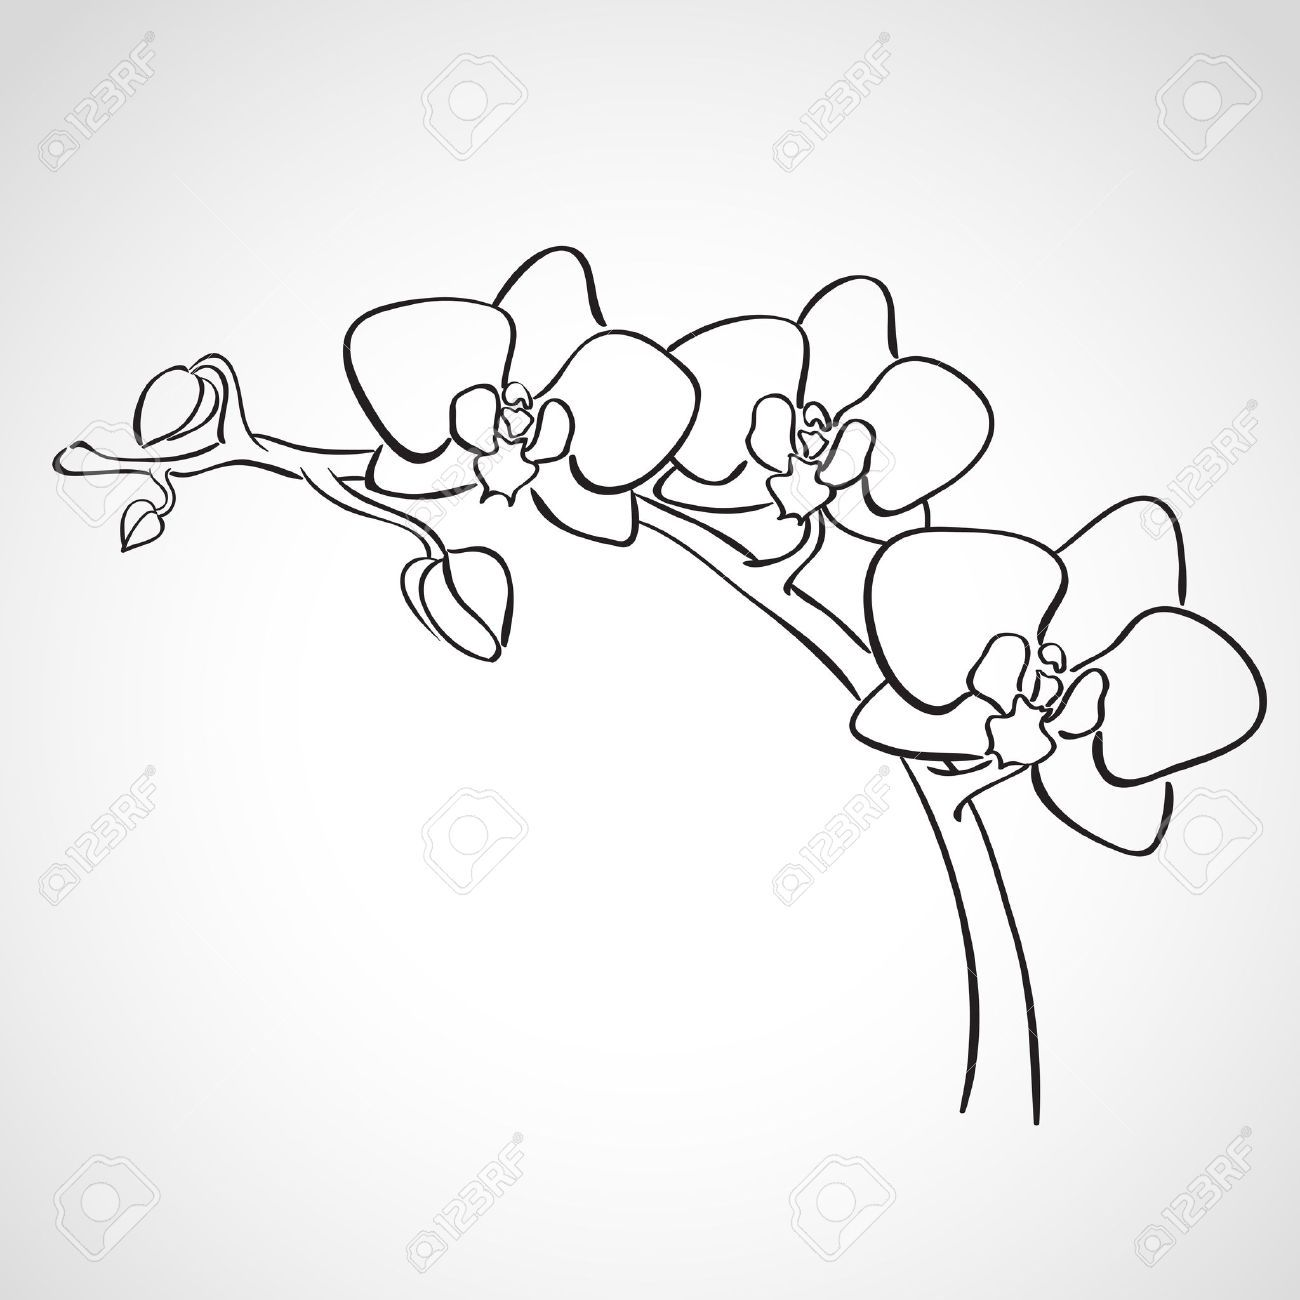 - Dessin d orchidee ...